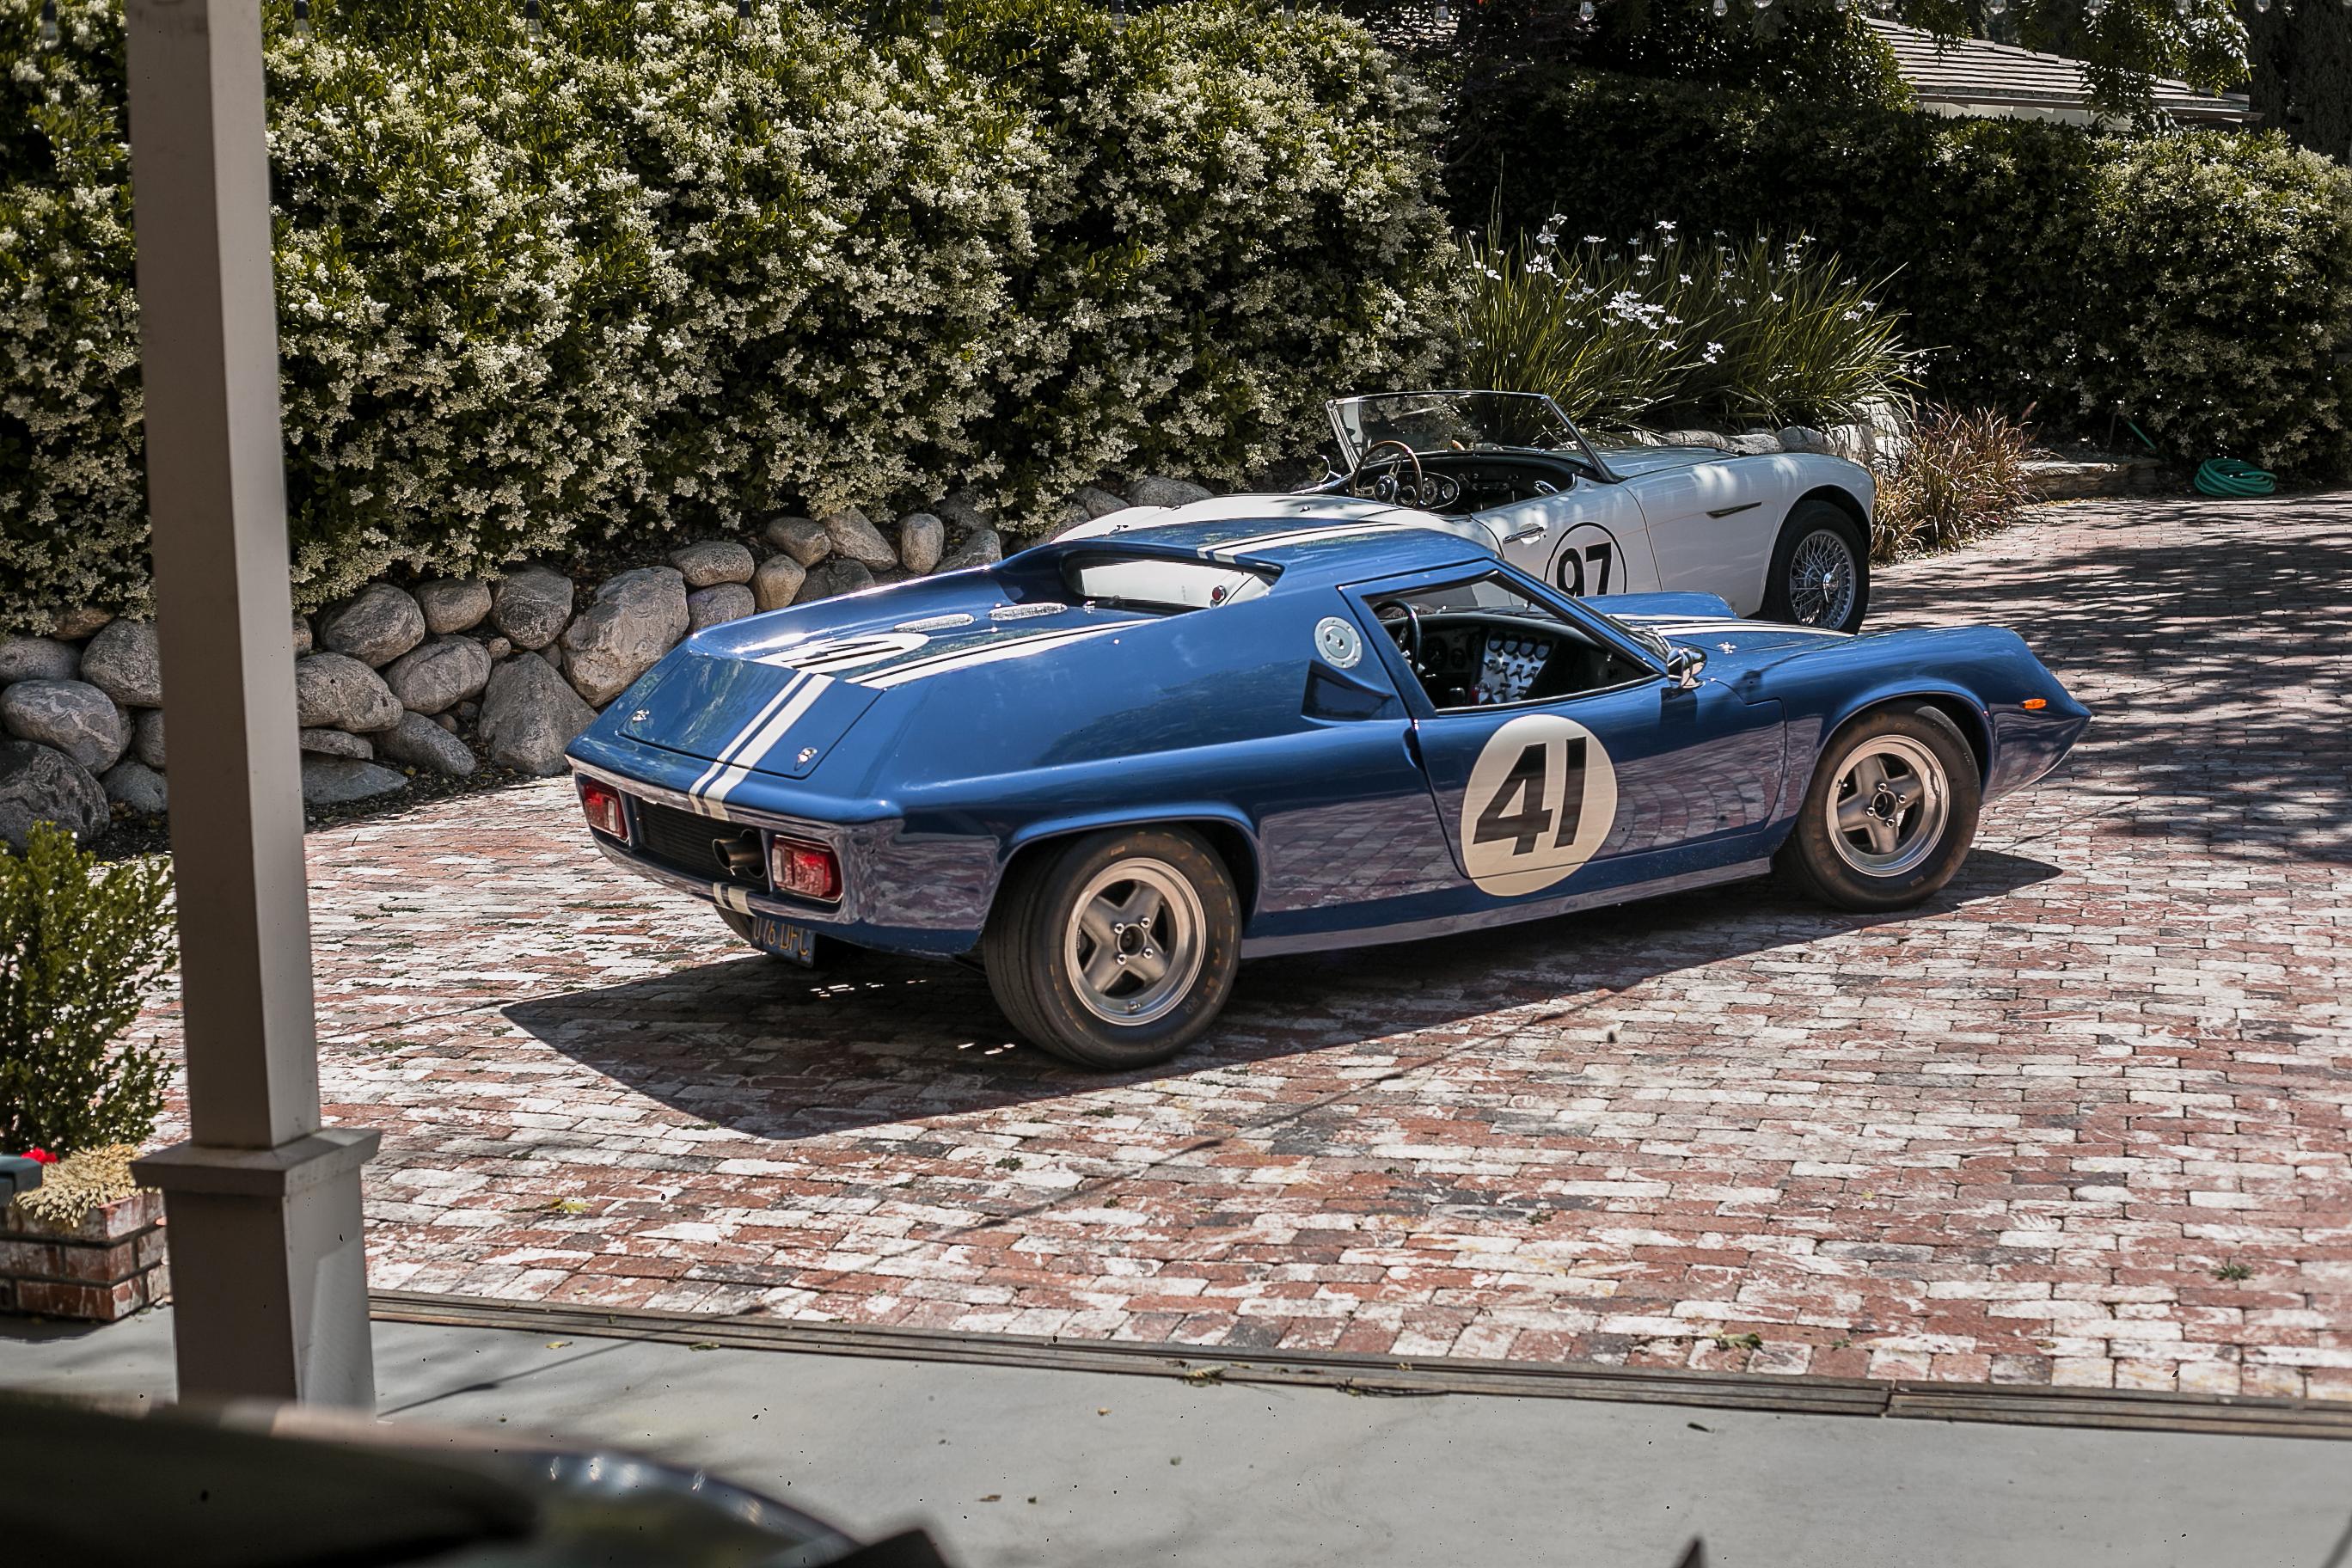 A 1970 Lotus Europa and and a 1960 Austin-Healey 3000 MkI